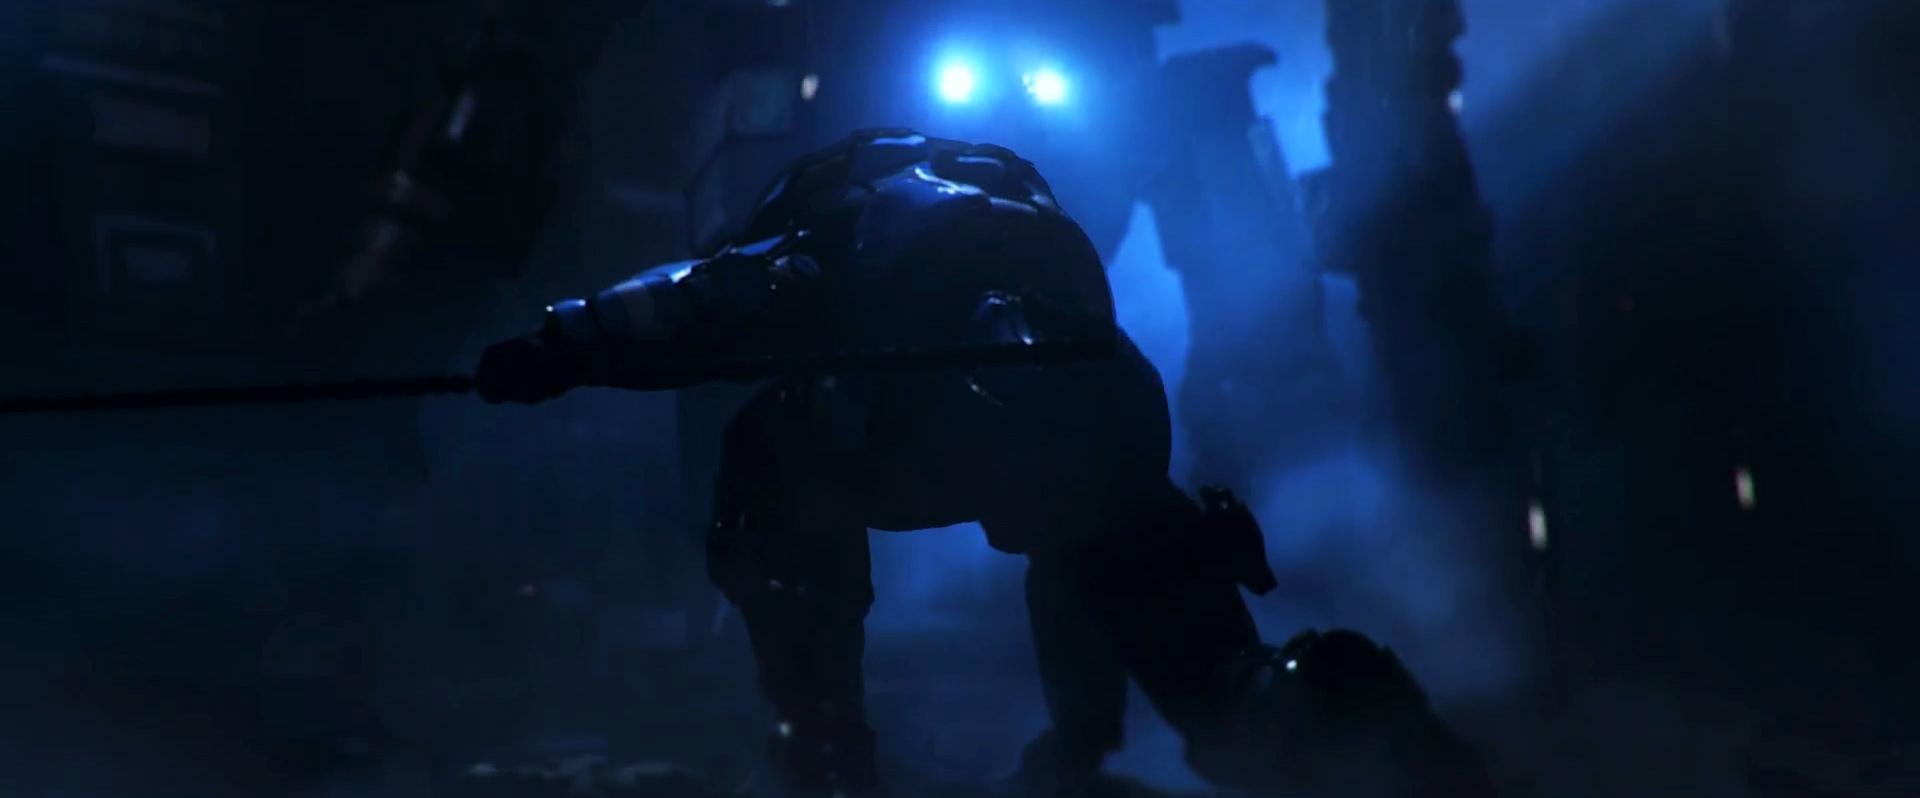 amazingly-cool-sci-fi-short-film-azarkant-8.jpg